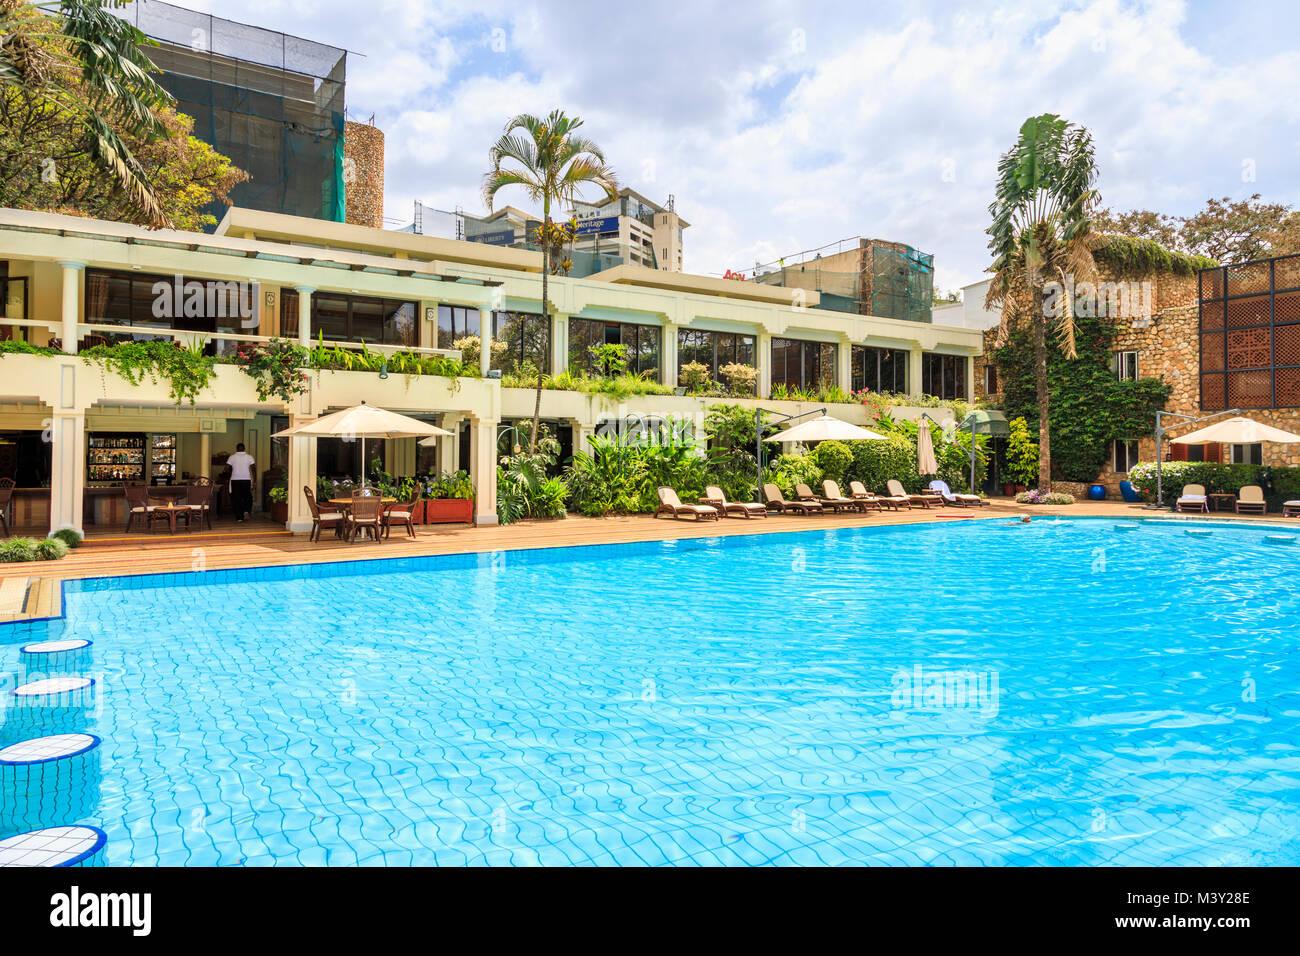 Kenya city tourist stock photos kenya city tourist stock - Star city swimming pool ...